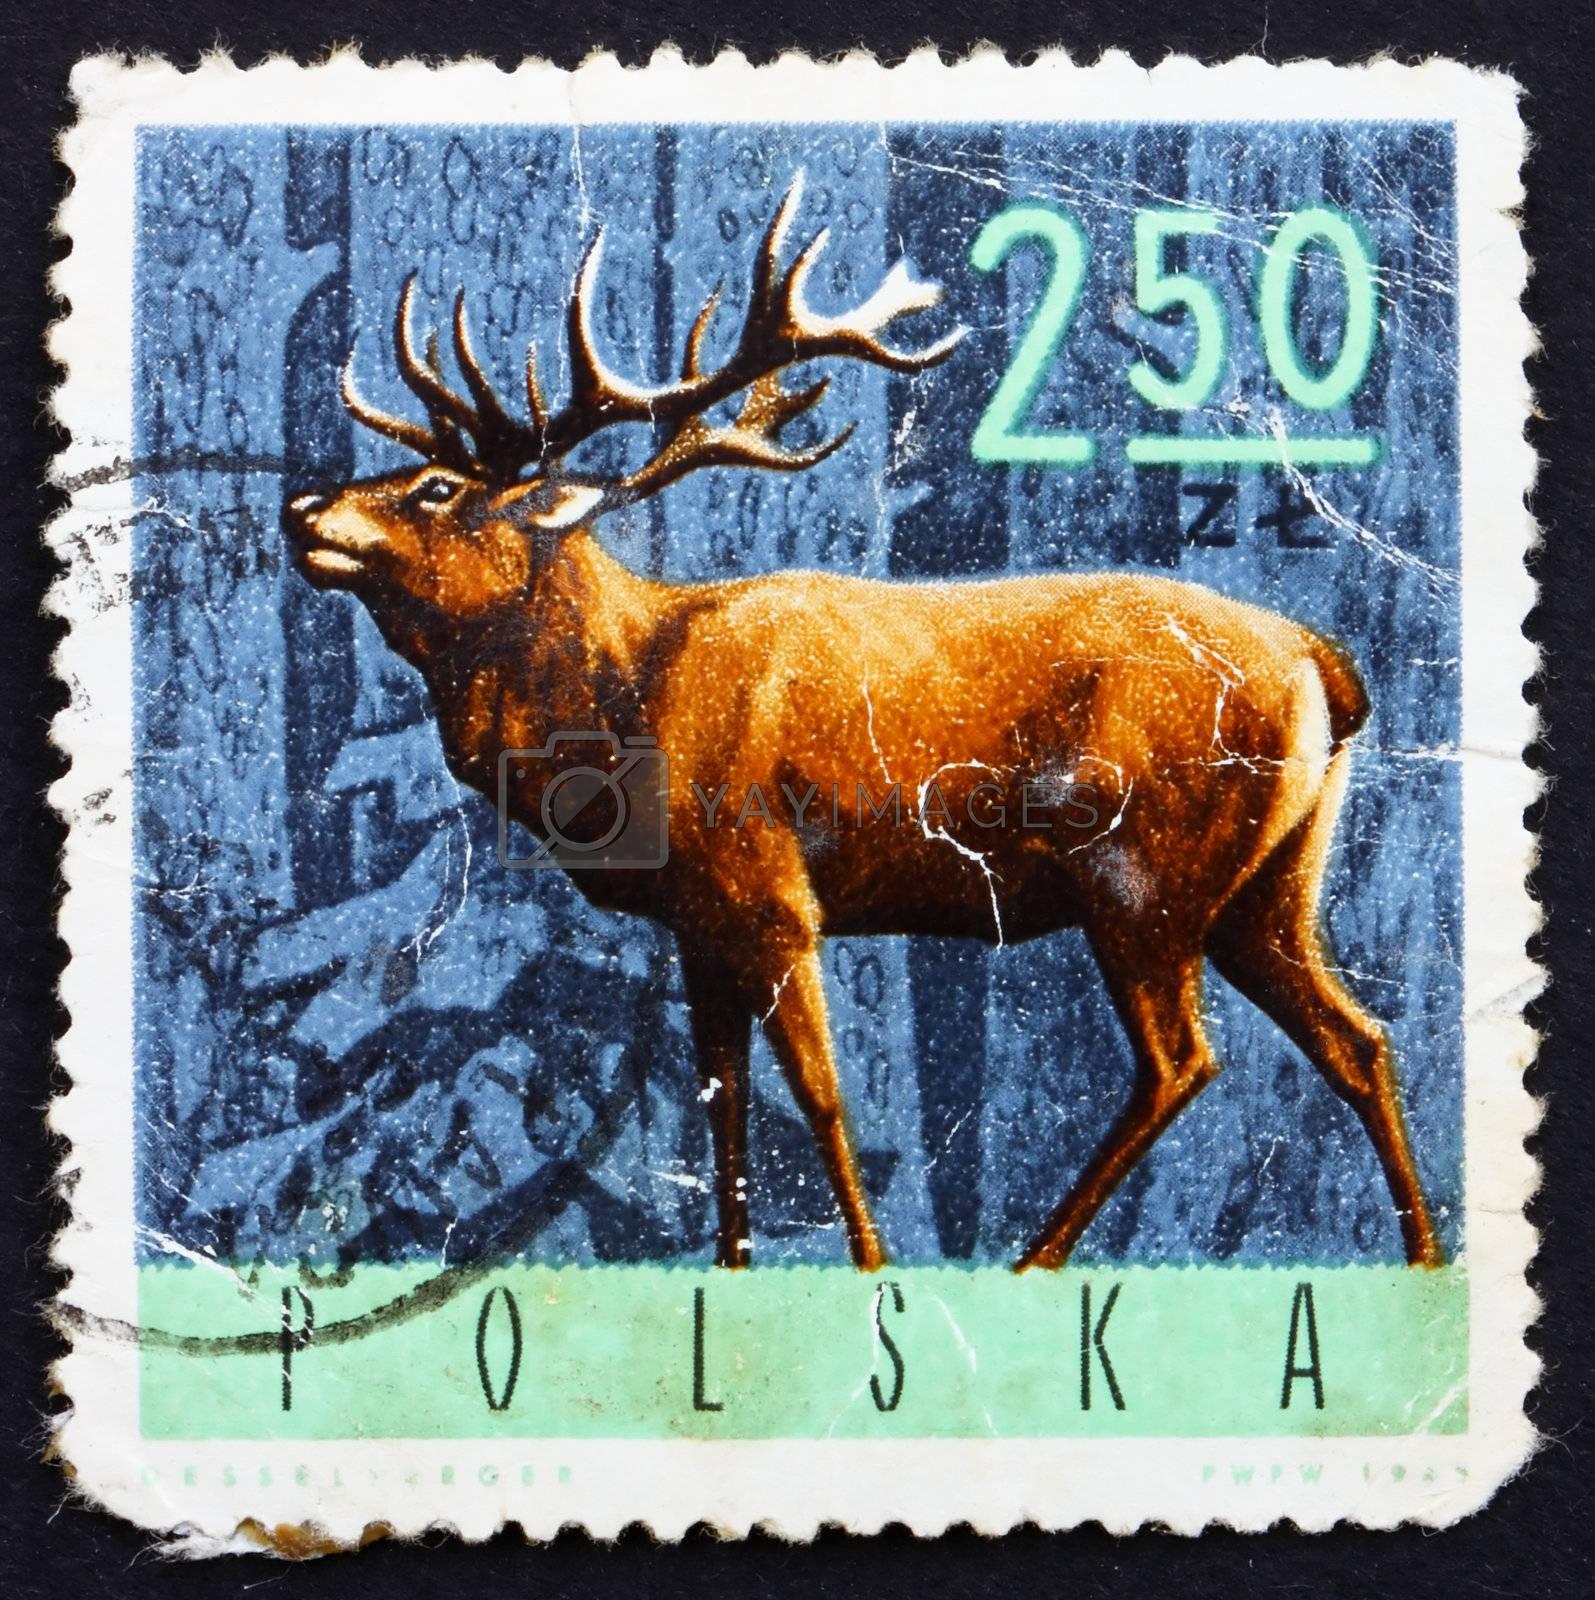 POLAND - CIRCA 1965: a stamp printed in the Poland shows Red Deer, Cervus Elaphus, circa 1965